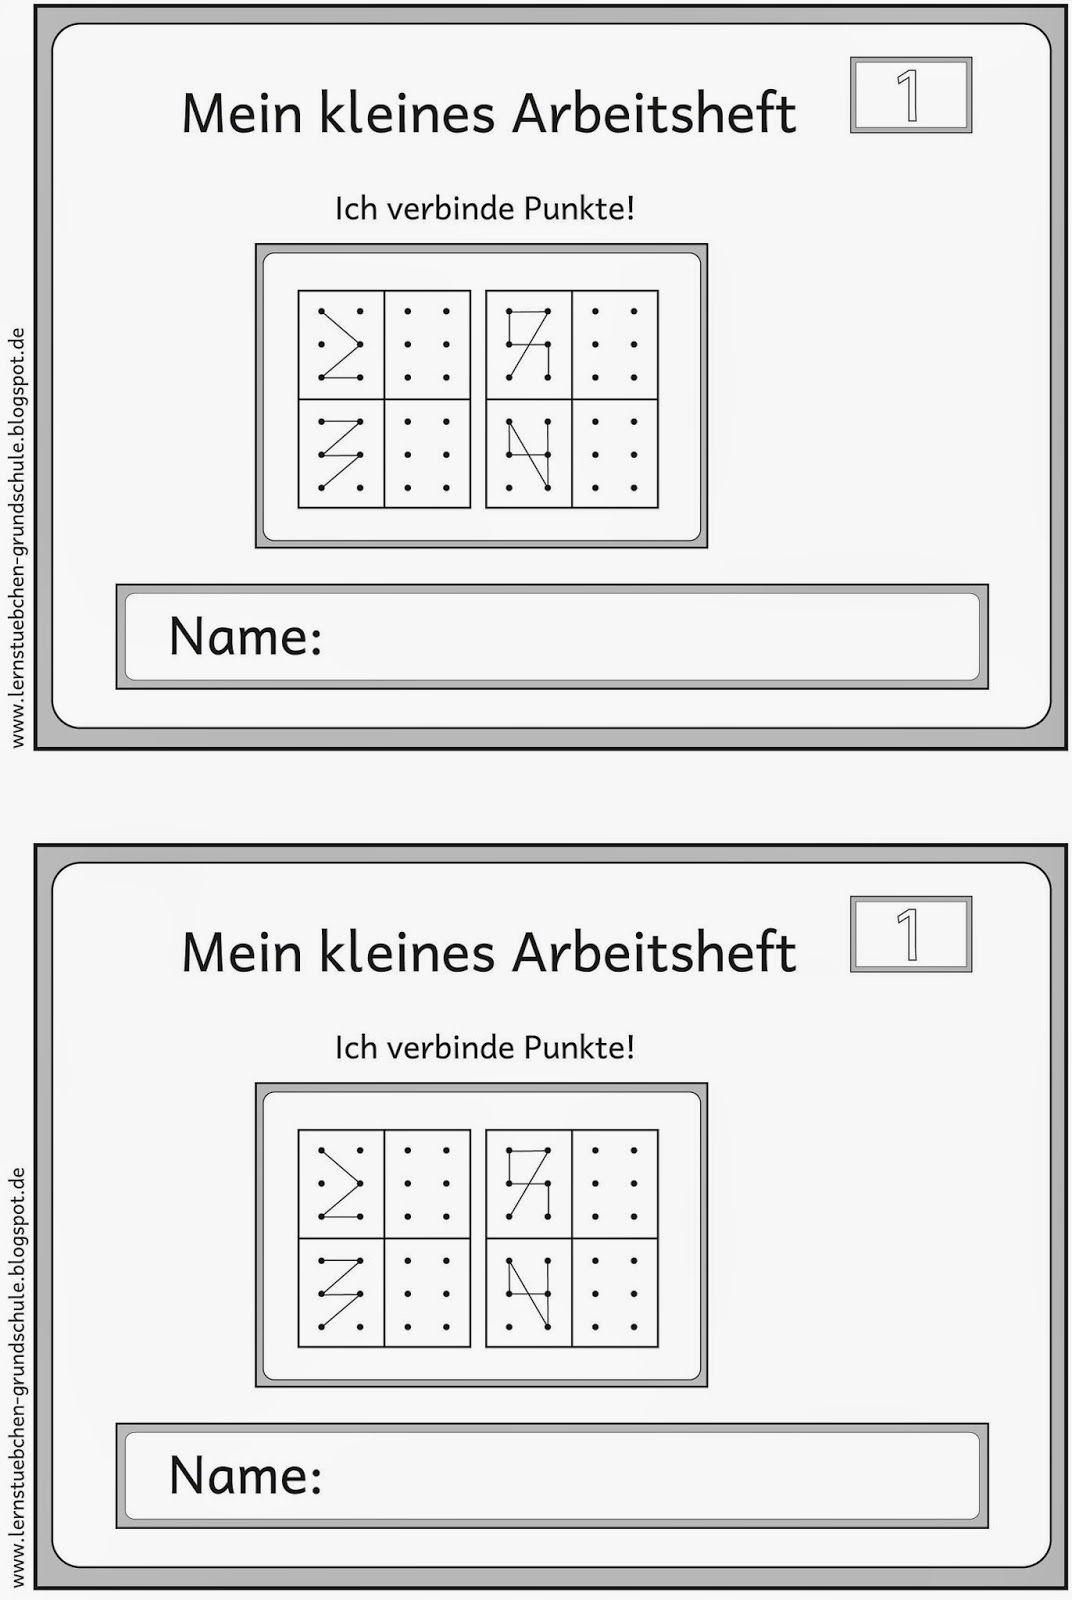 Punkte verbinden (1) | Punkte verbinden, Punkt und Mathe